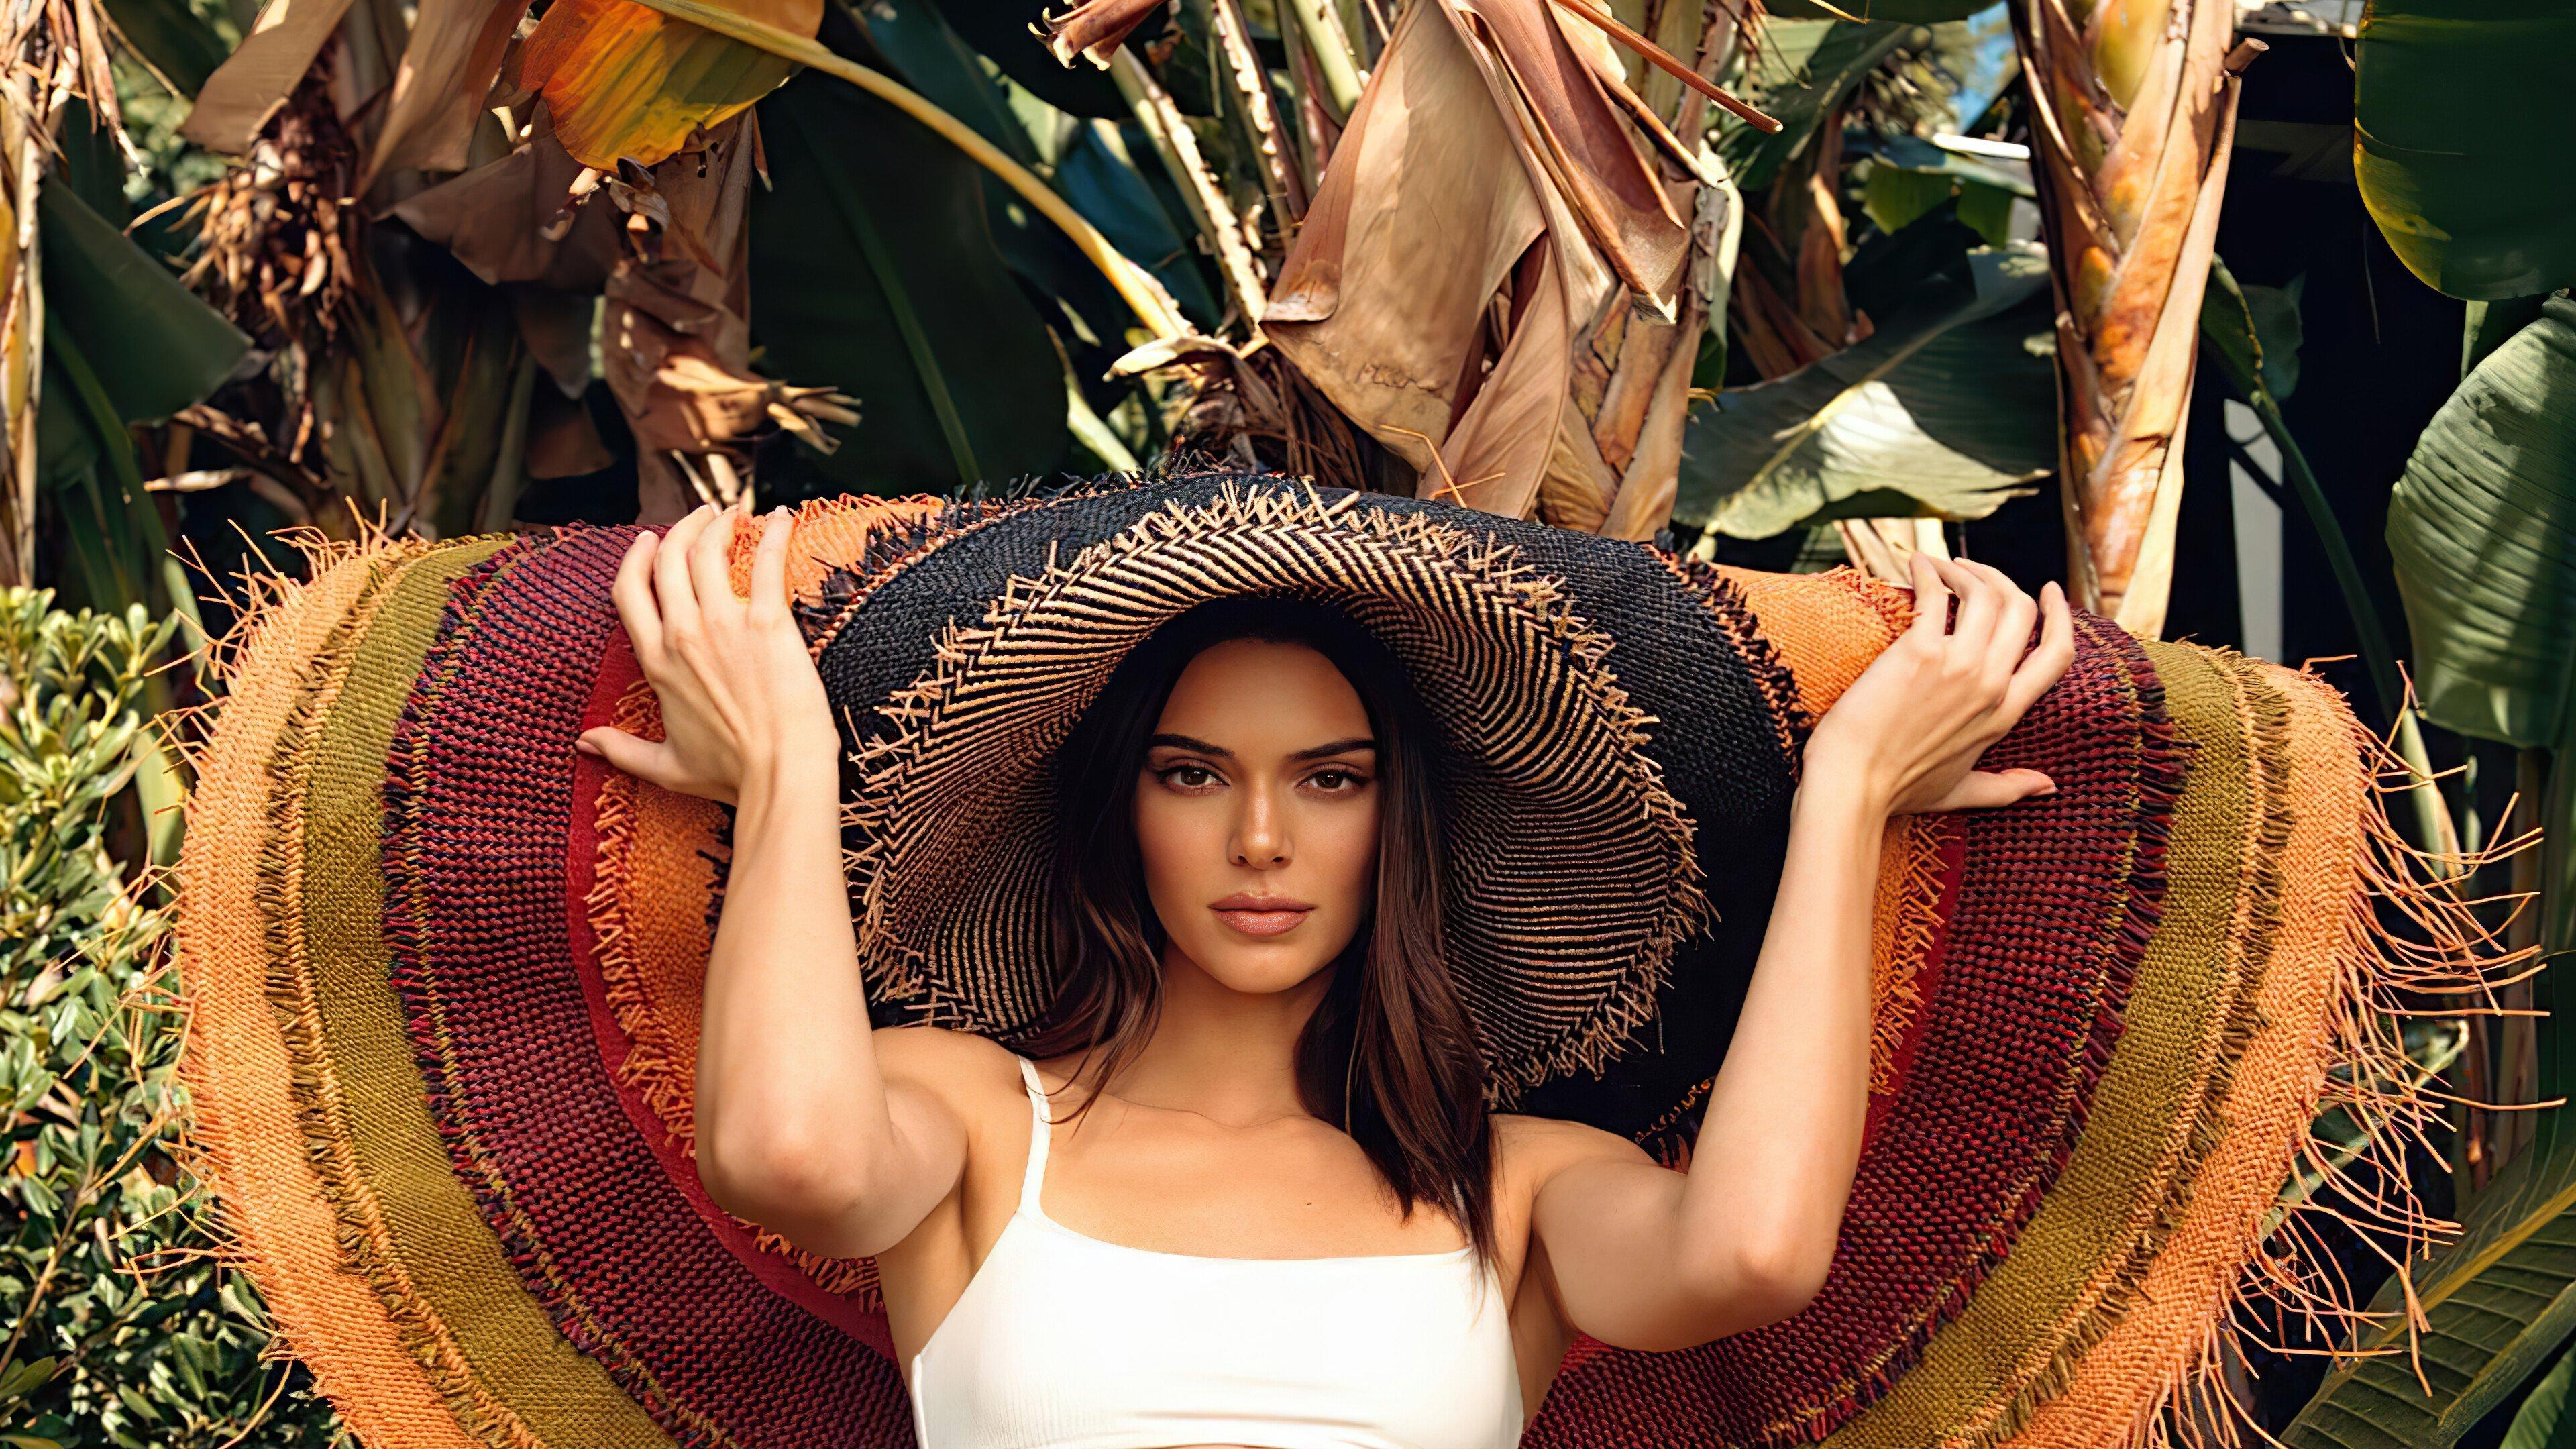 Wallpaper Kendall Jenner in photoshoot